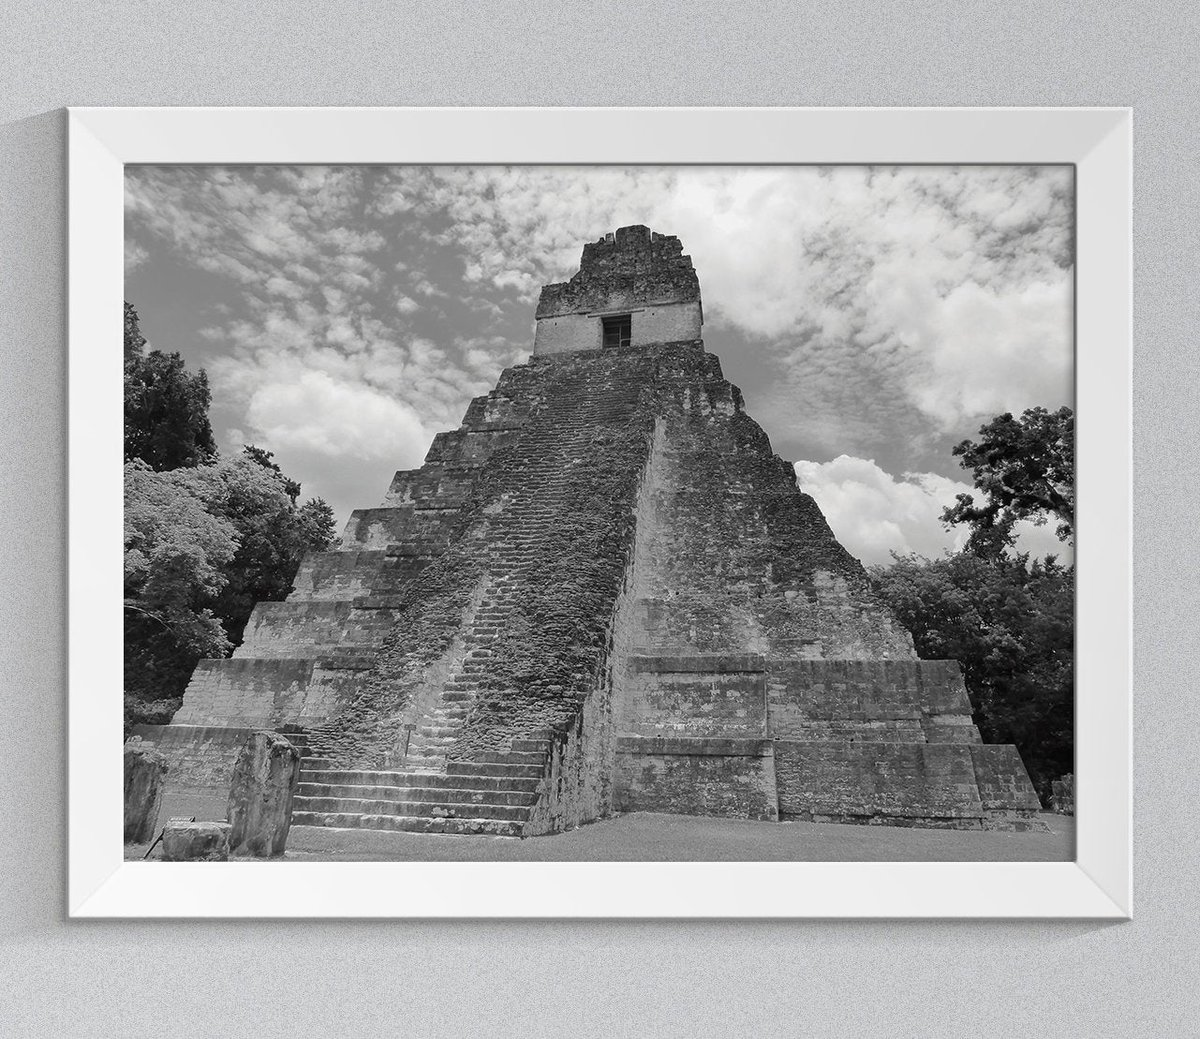 Excited to share the latest addition to my #etsy shop: Mayan ruins, mayan wall art, mayan decor, mayan art, mayan aztec, mayan print, mayan designs, mayan symbols, tikal guatemala, mayan gift,  #art #drawing #white #moving #christmas #black